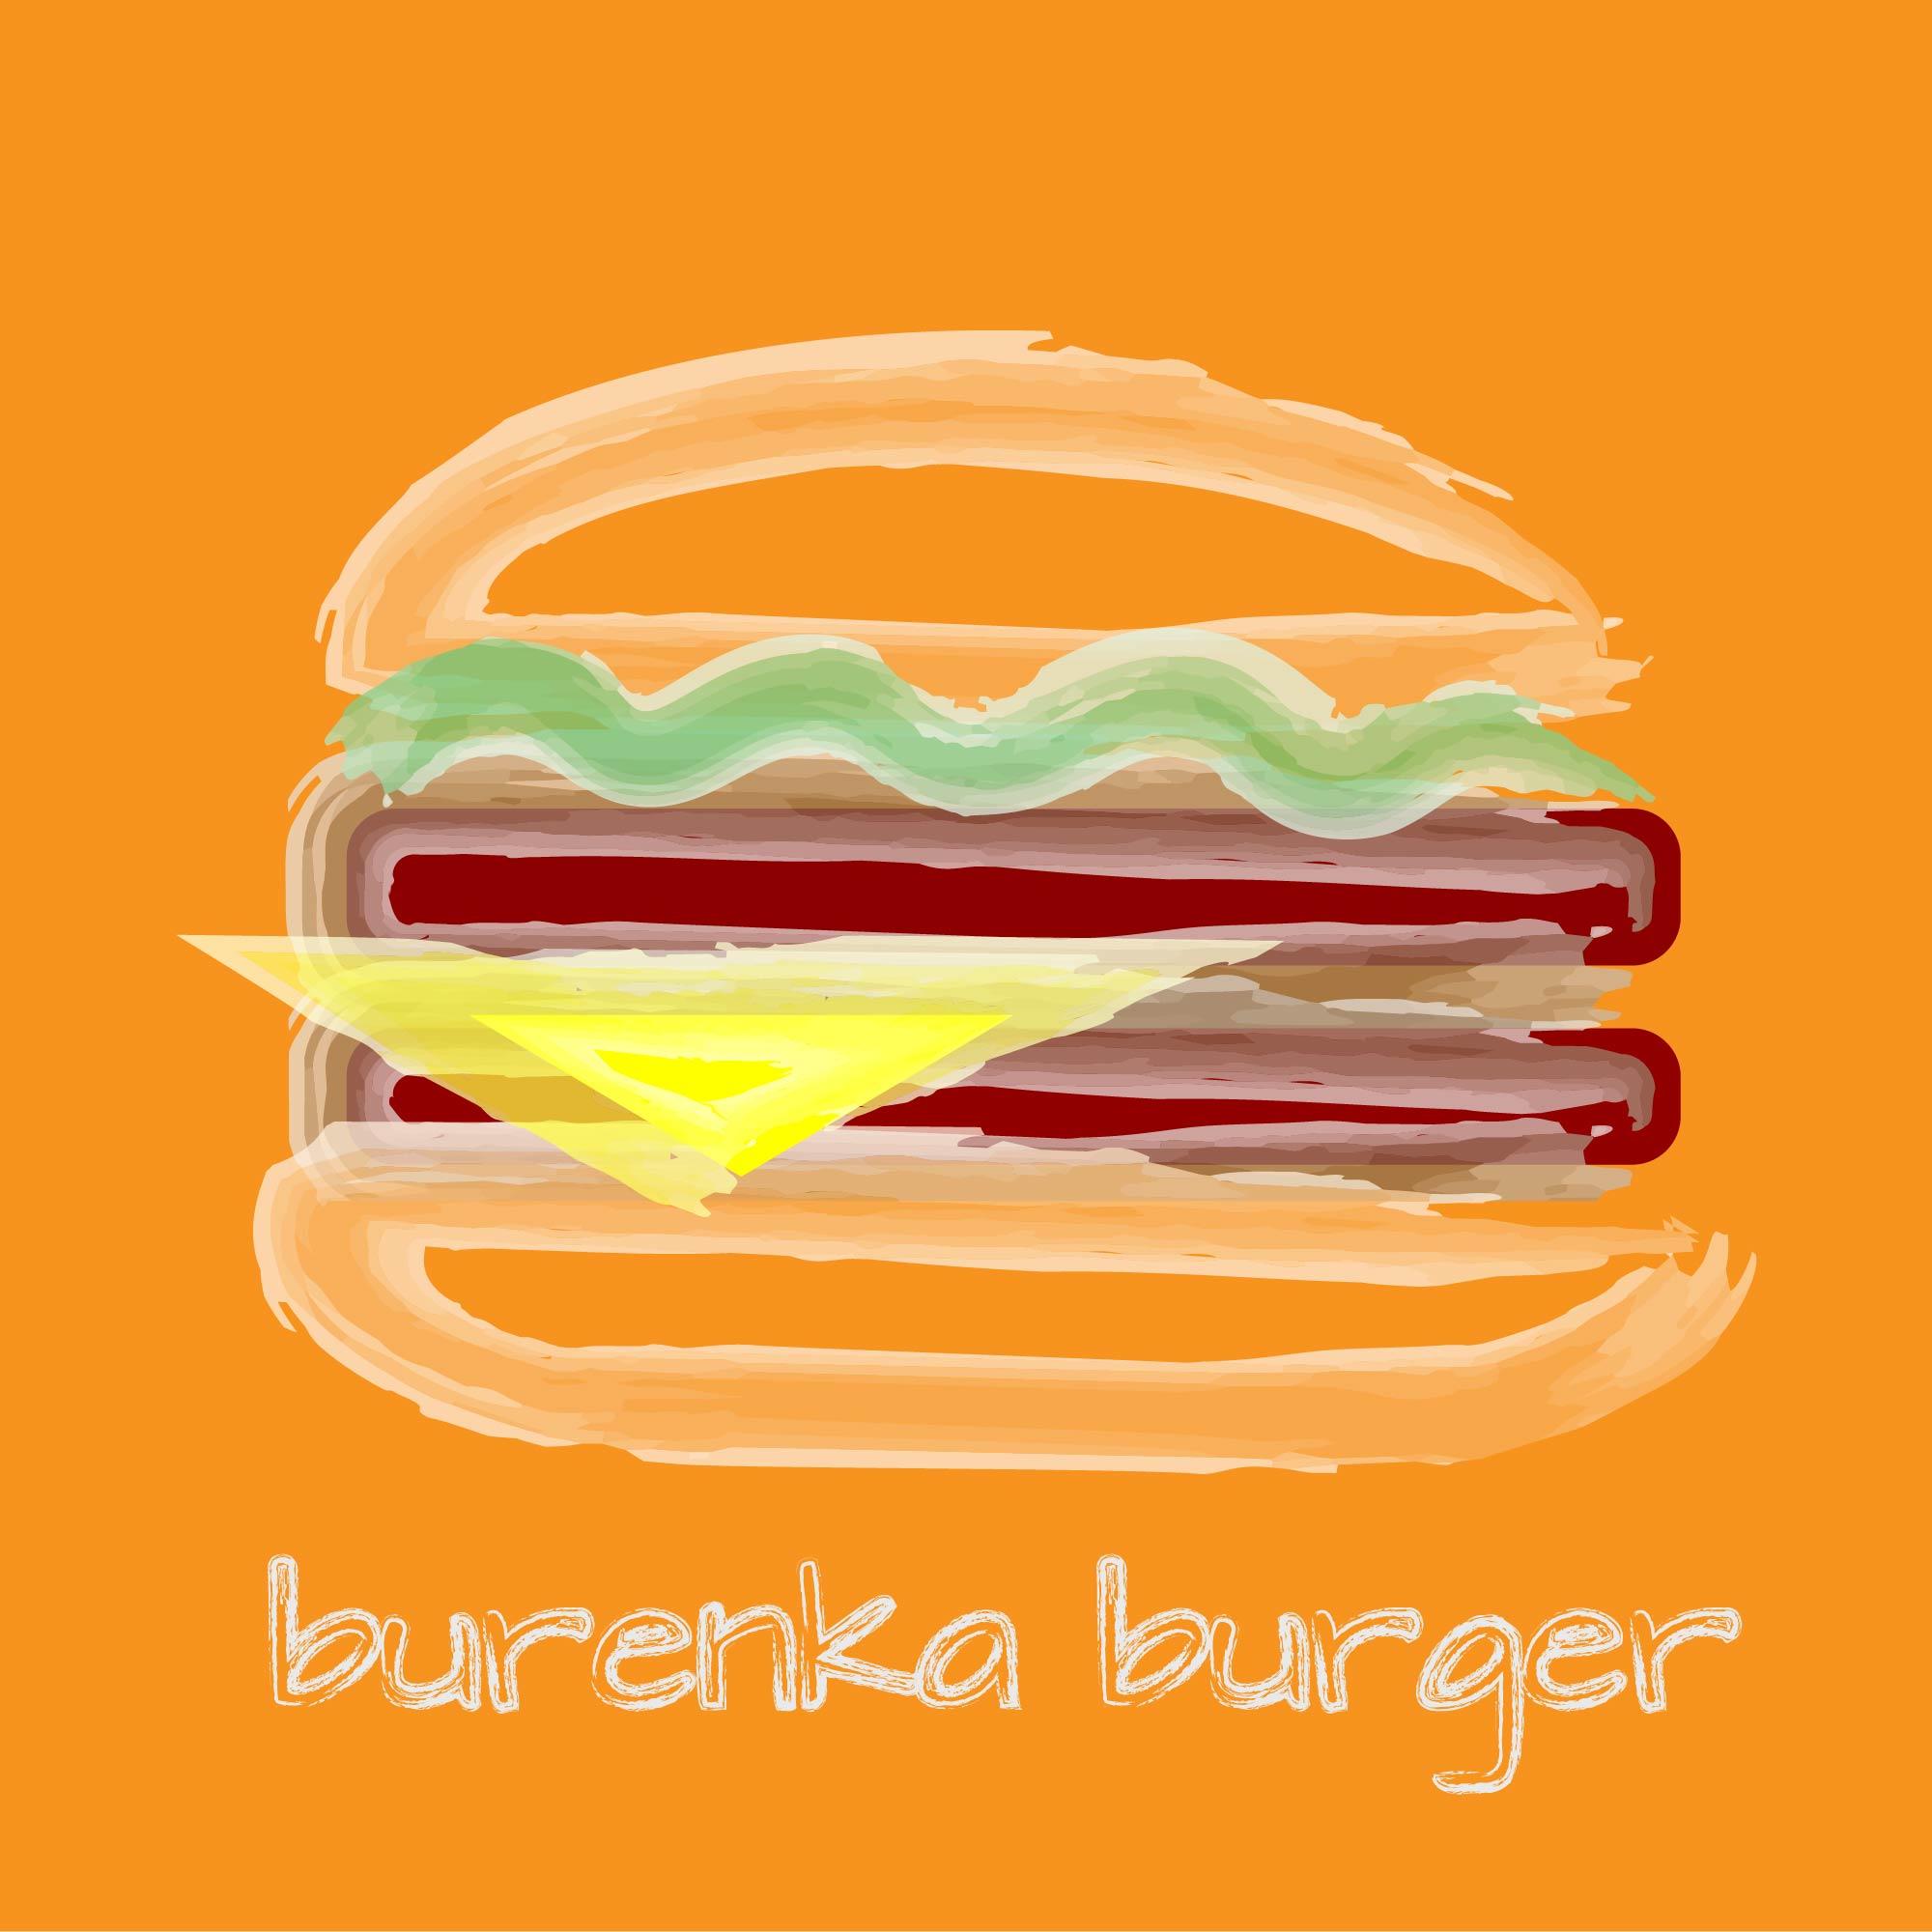 Логотип для Бургерной с Пекарней фото f_2825e15d28c33f92.jpg